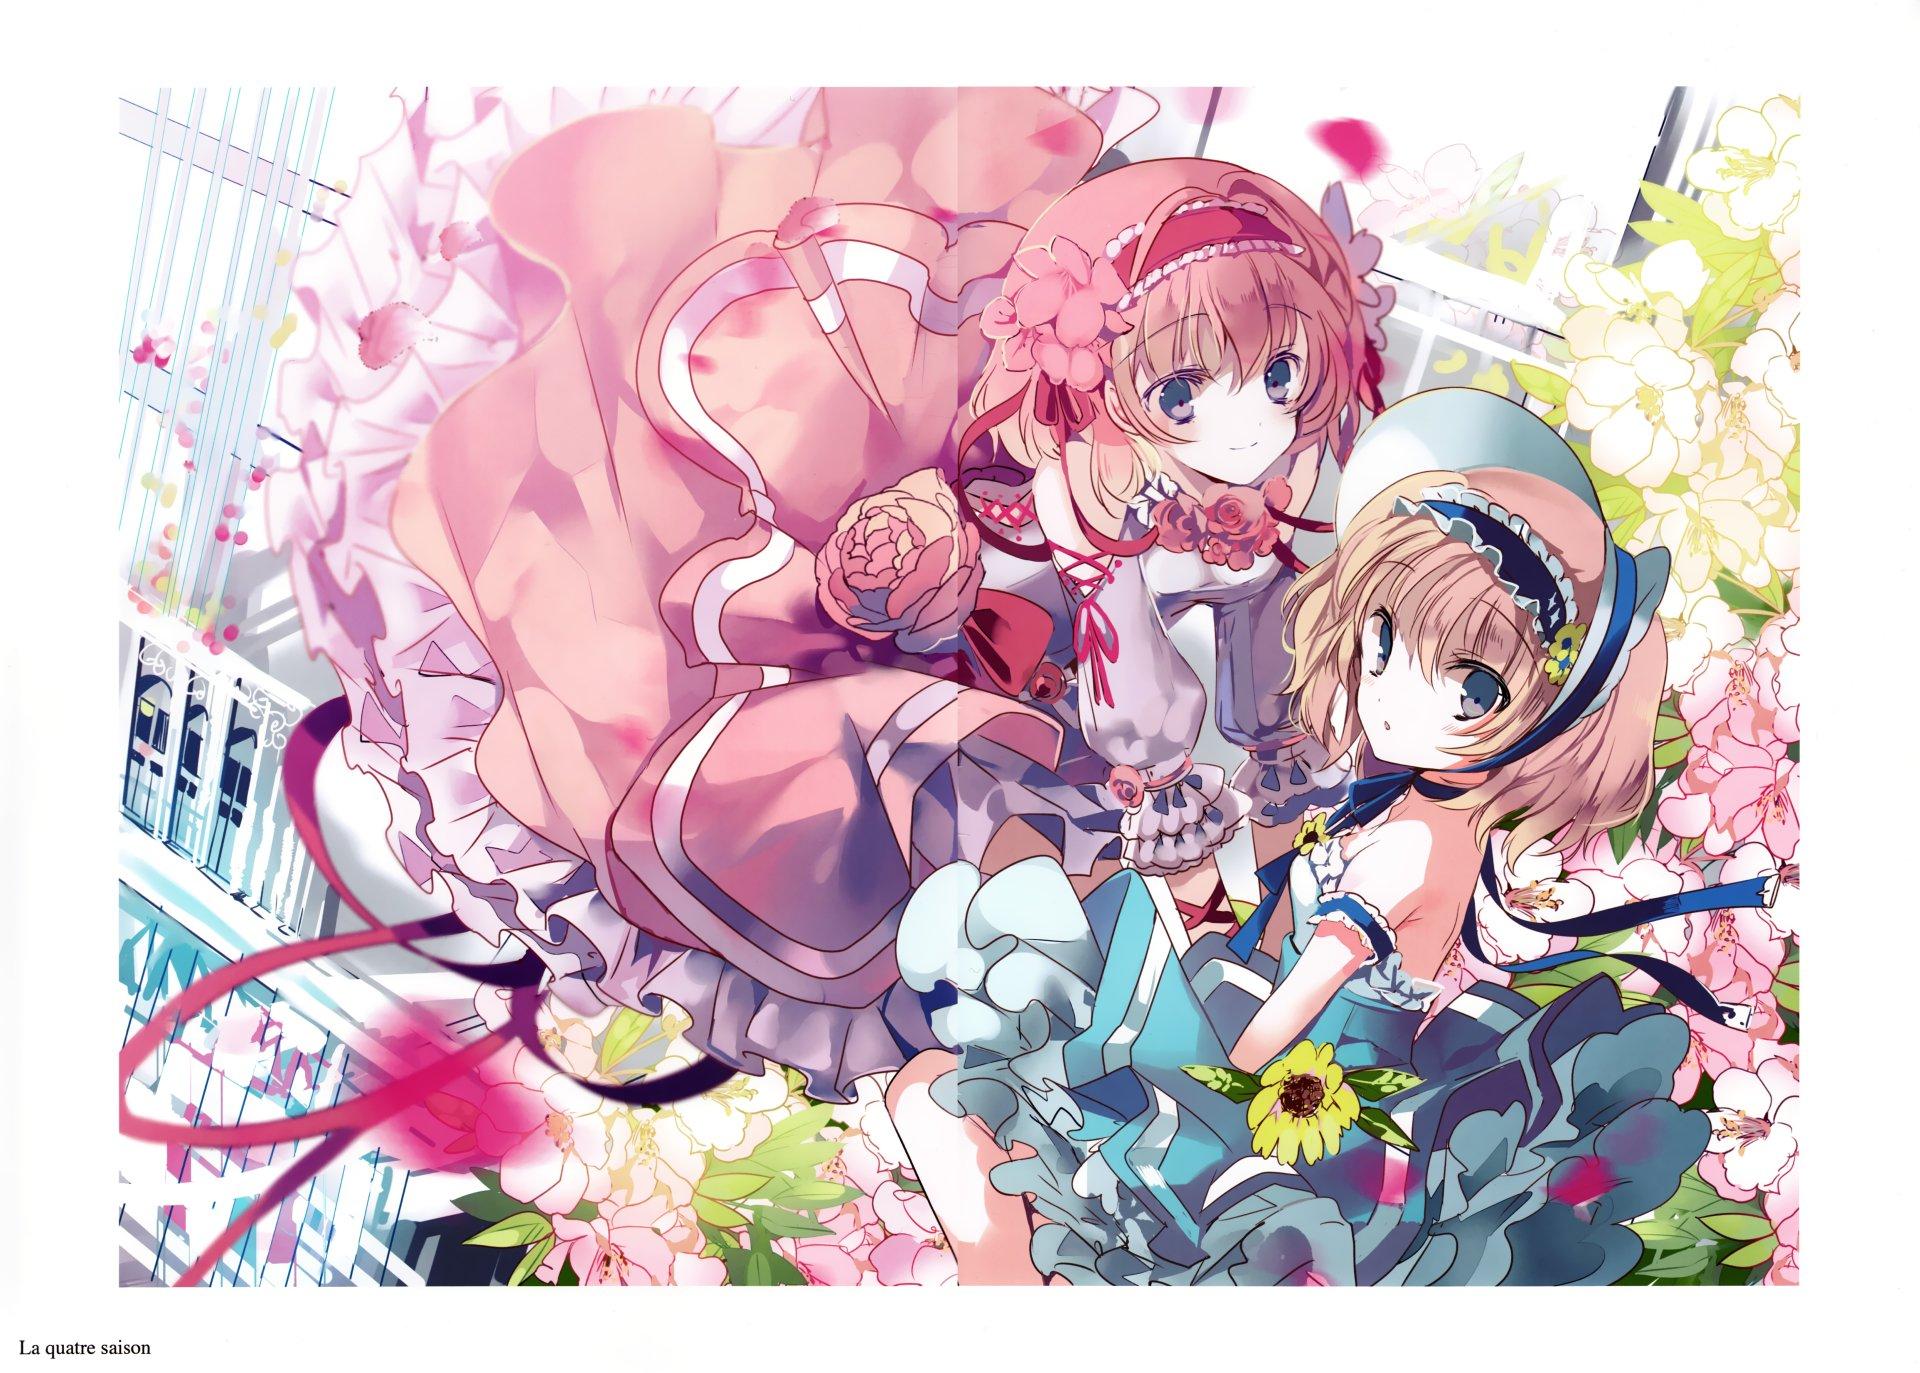 Anime - Touhou  Anime Alice Margatroid Pink Hair Long Hair Headband Blue Eyes Pink Dress Blue Dress Flower Wallpaper